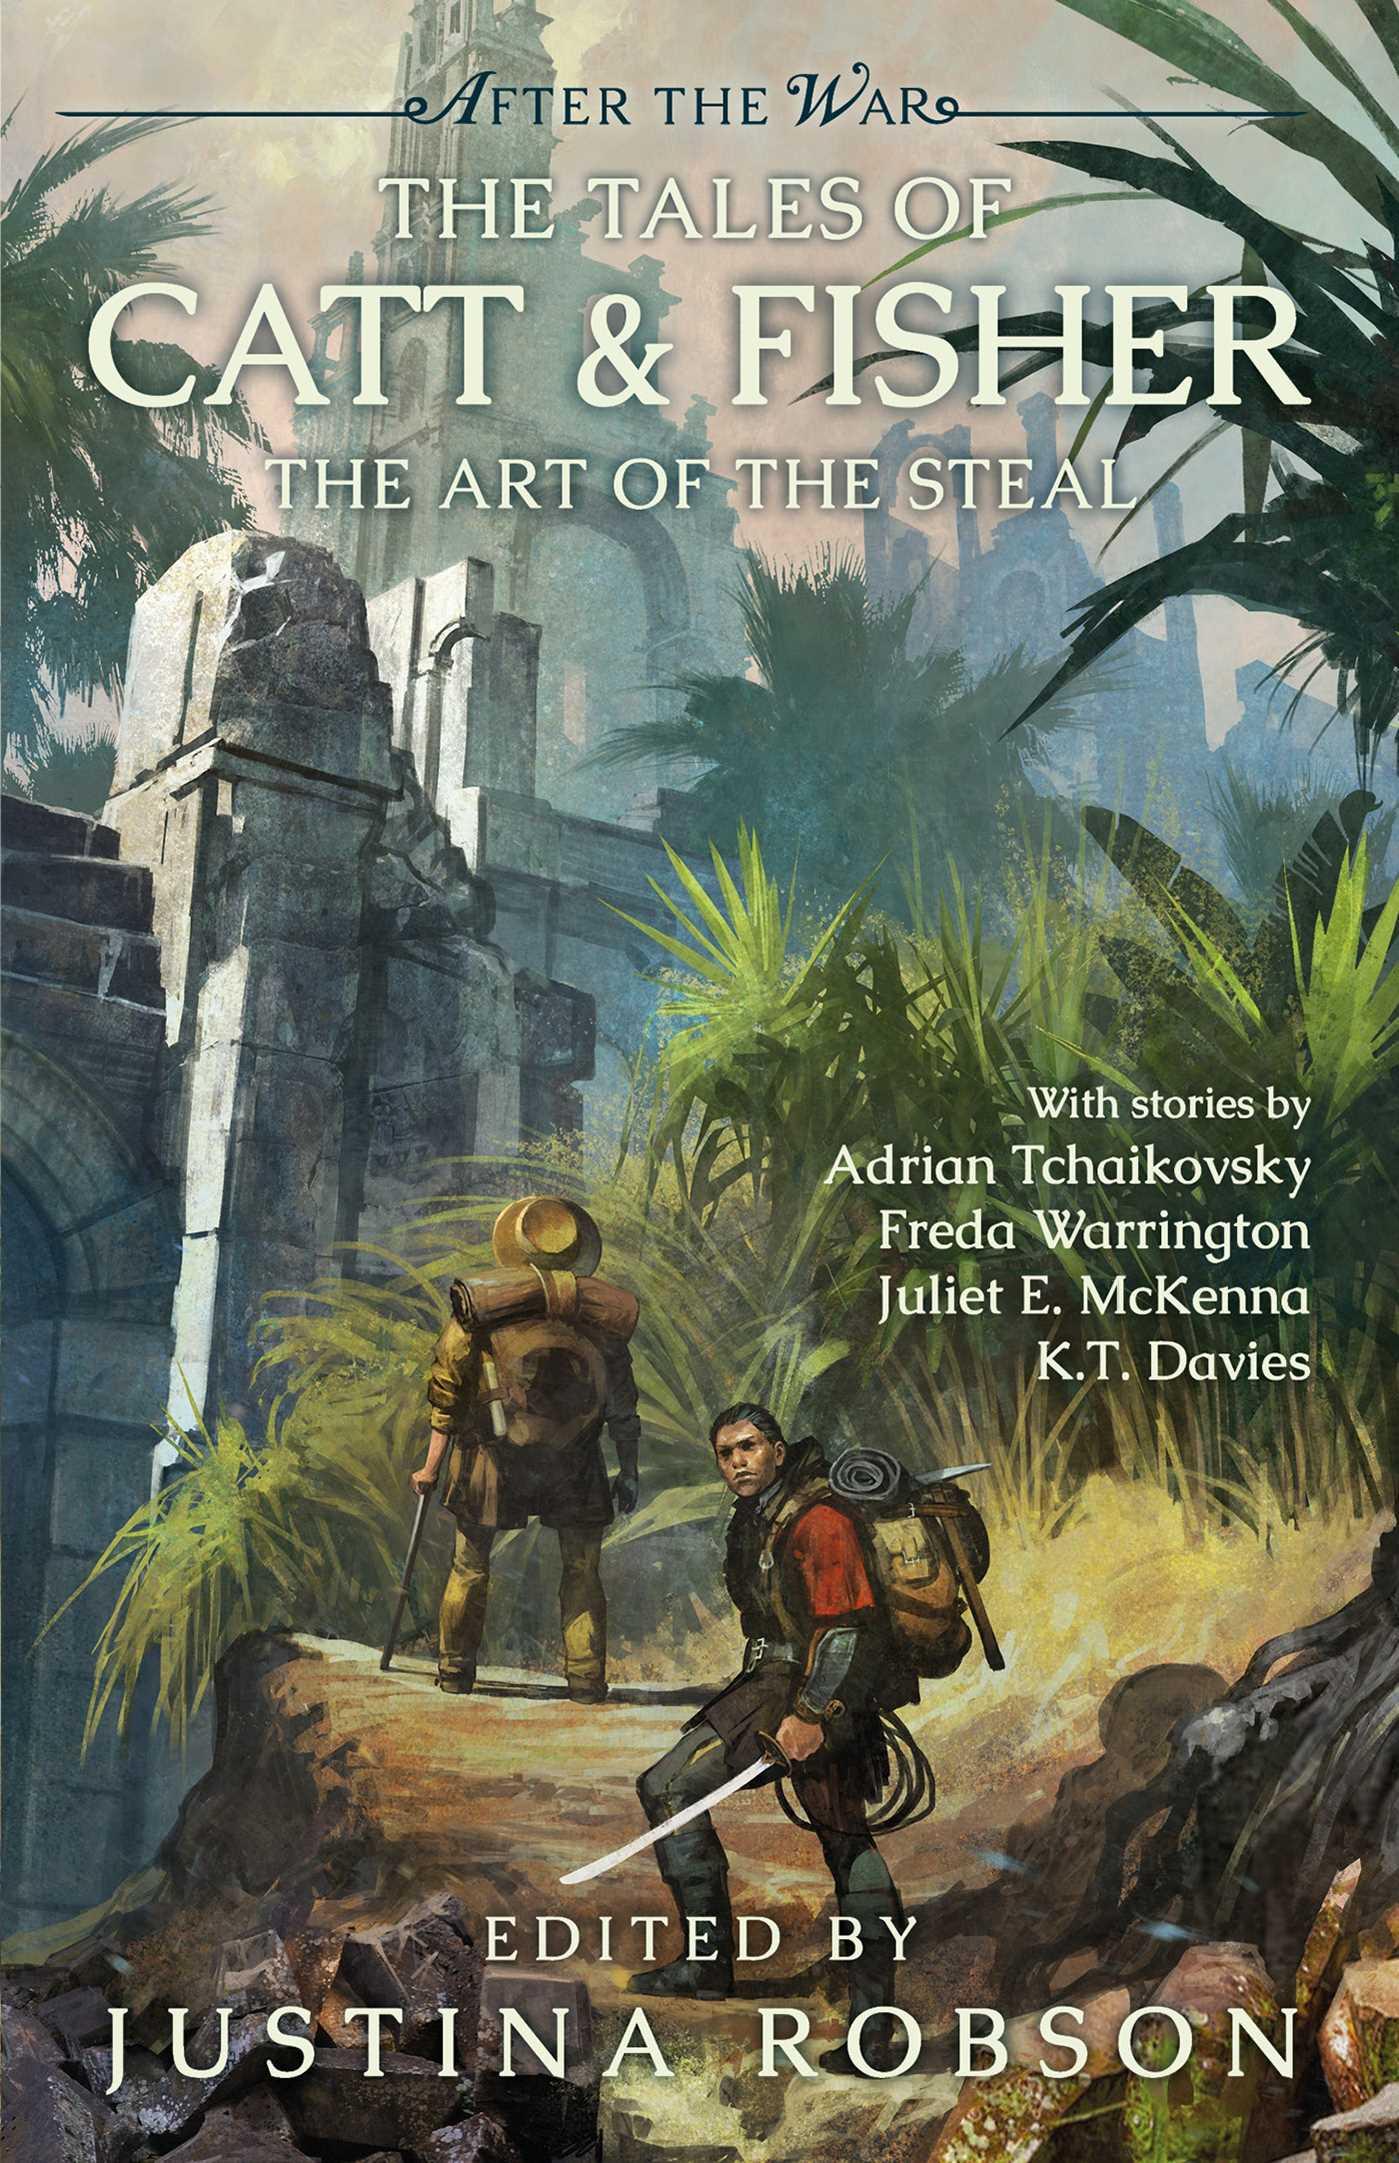 After The War: The Tales of Catt & Fisher by Adrian Tchaikovsky, Justina Robson, Freda Warrington, Juliet E. McKenna, K.T. Davies